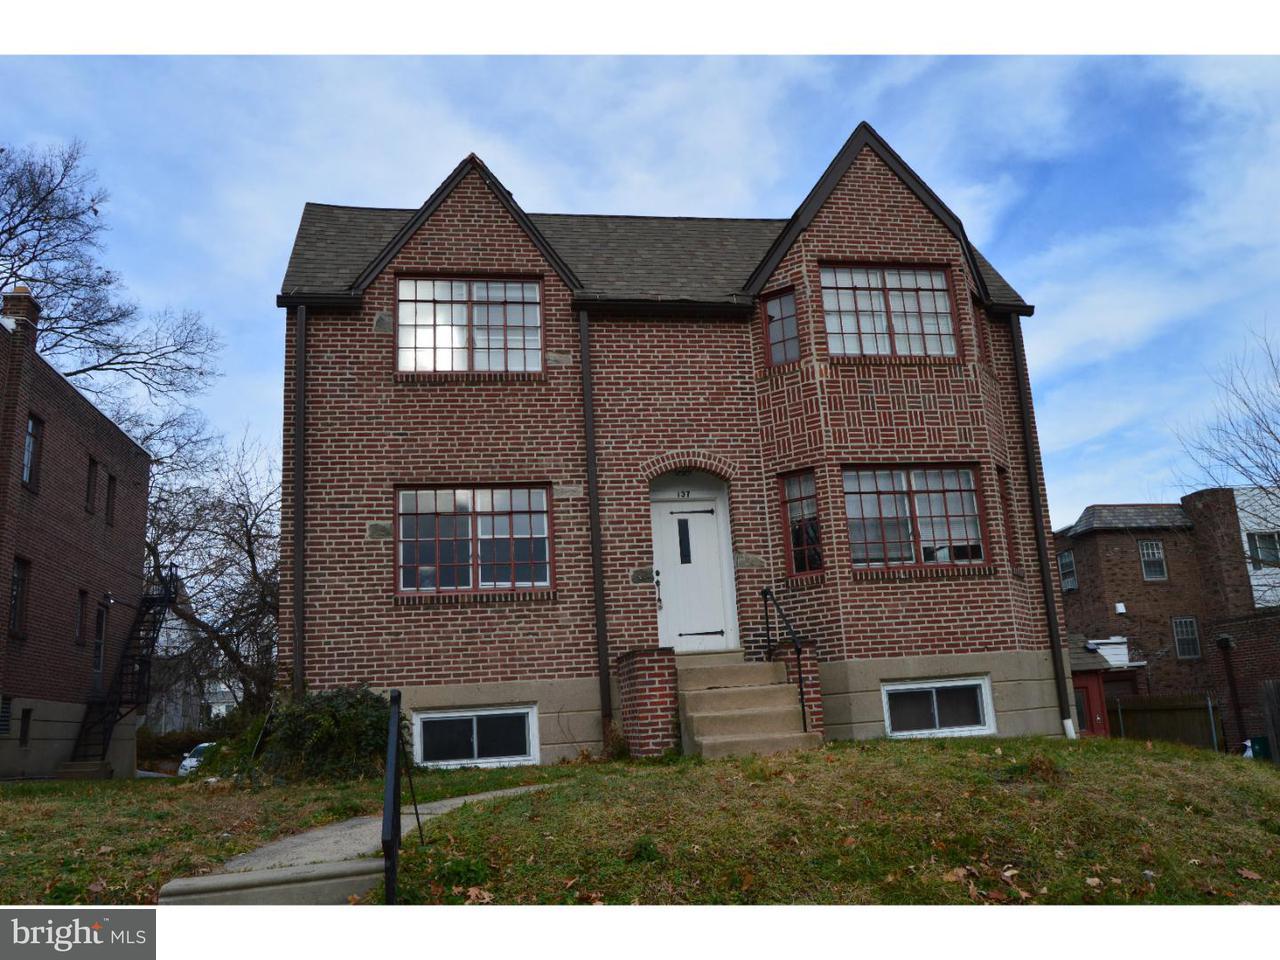 Quadraplex 为 出租 在 137 BERKLEY AVE #A Lansdowne, 宾夕法尼亚州 19050 美国